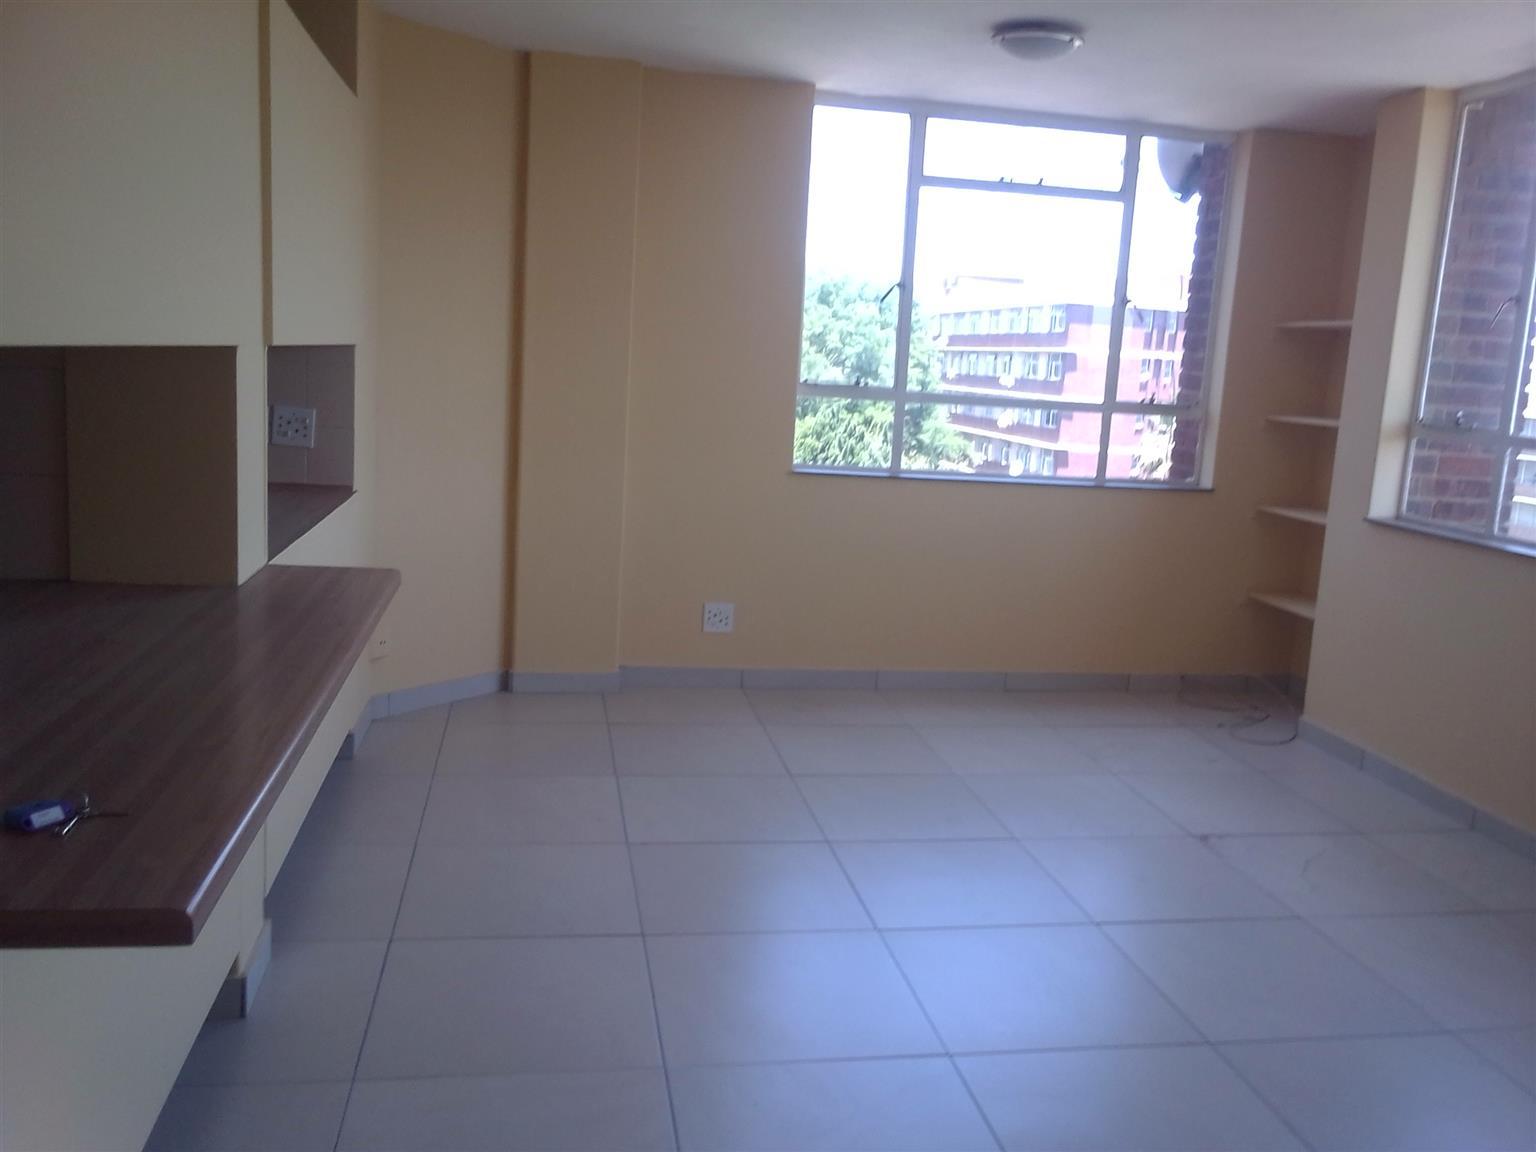 Flat available immediatelyGezinah for Rental